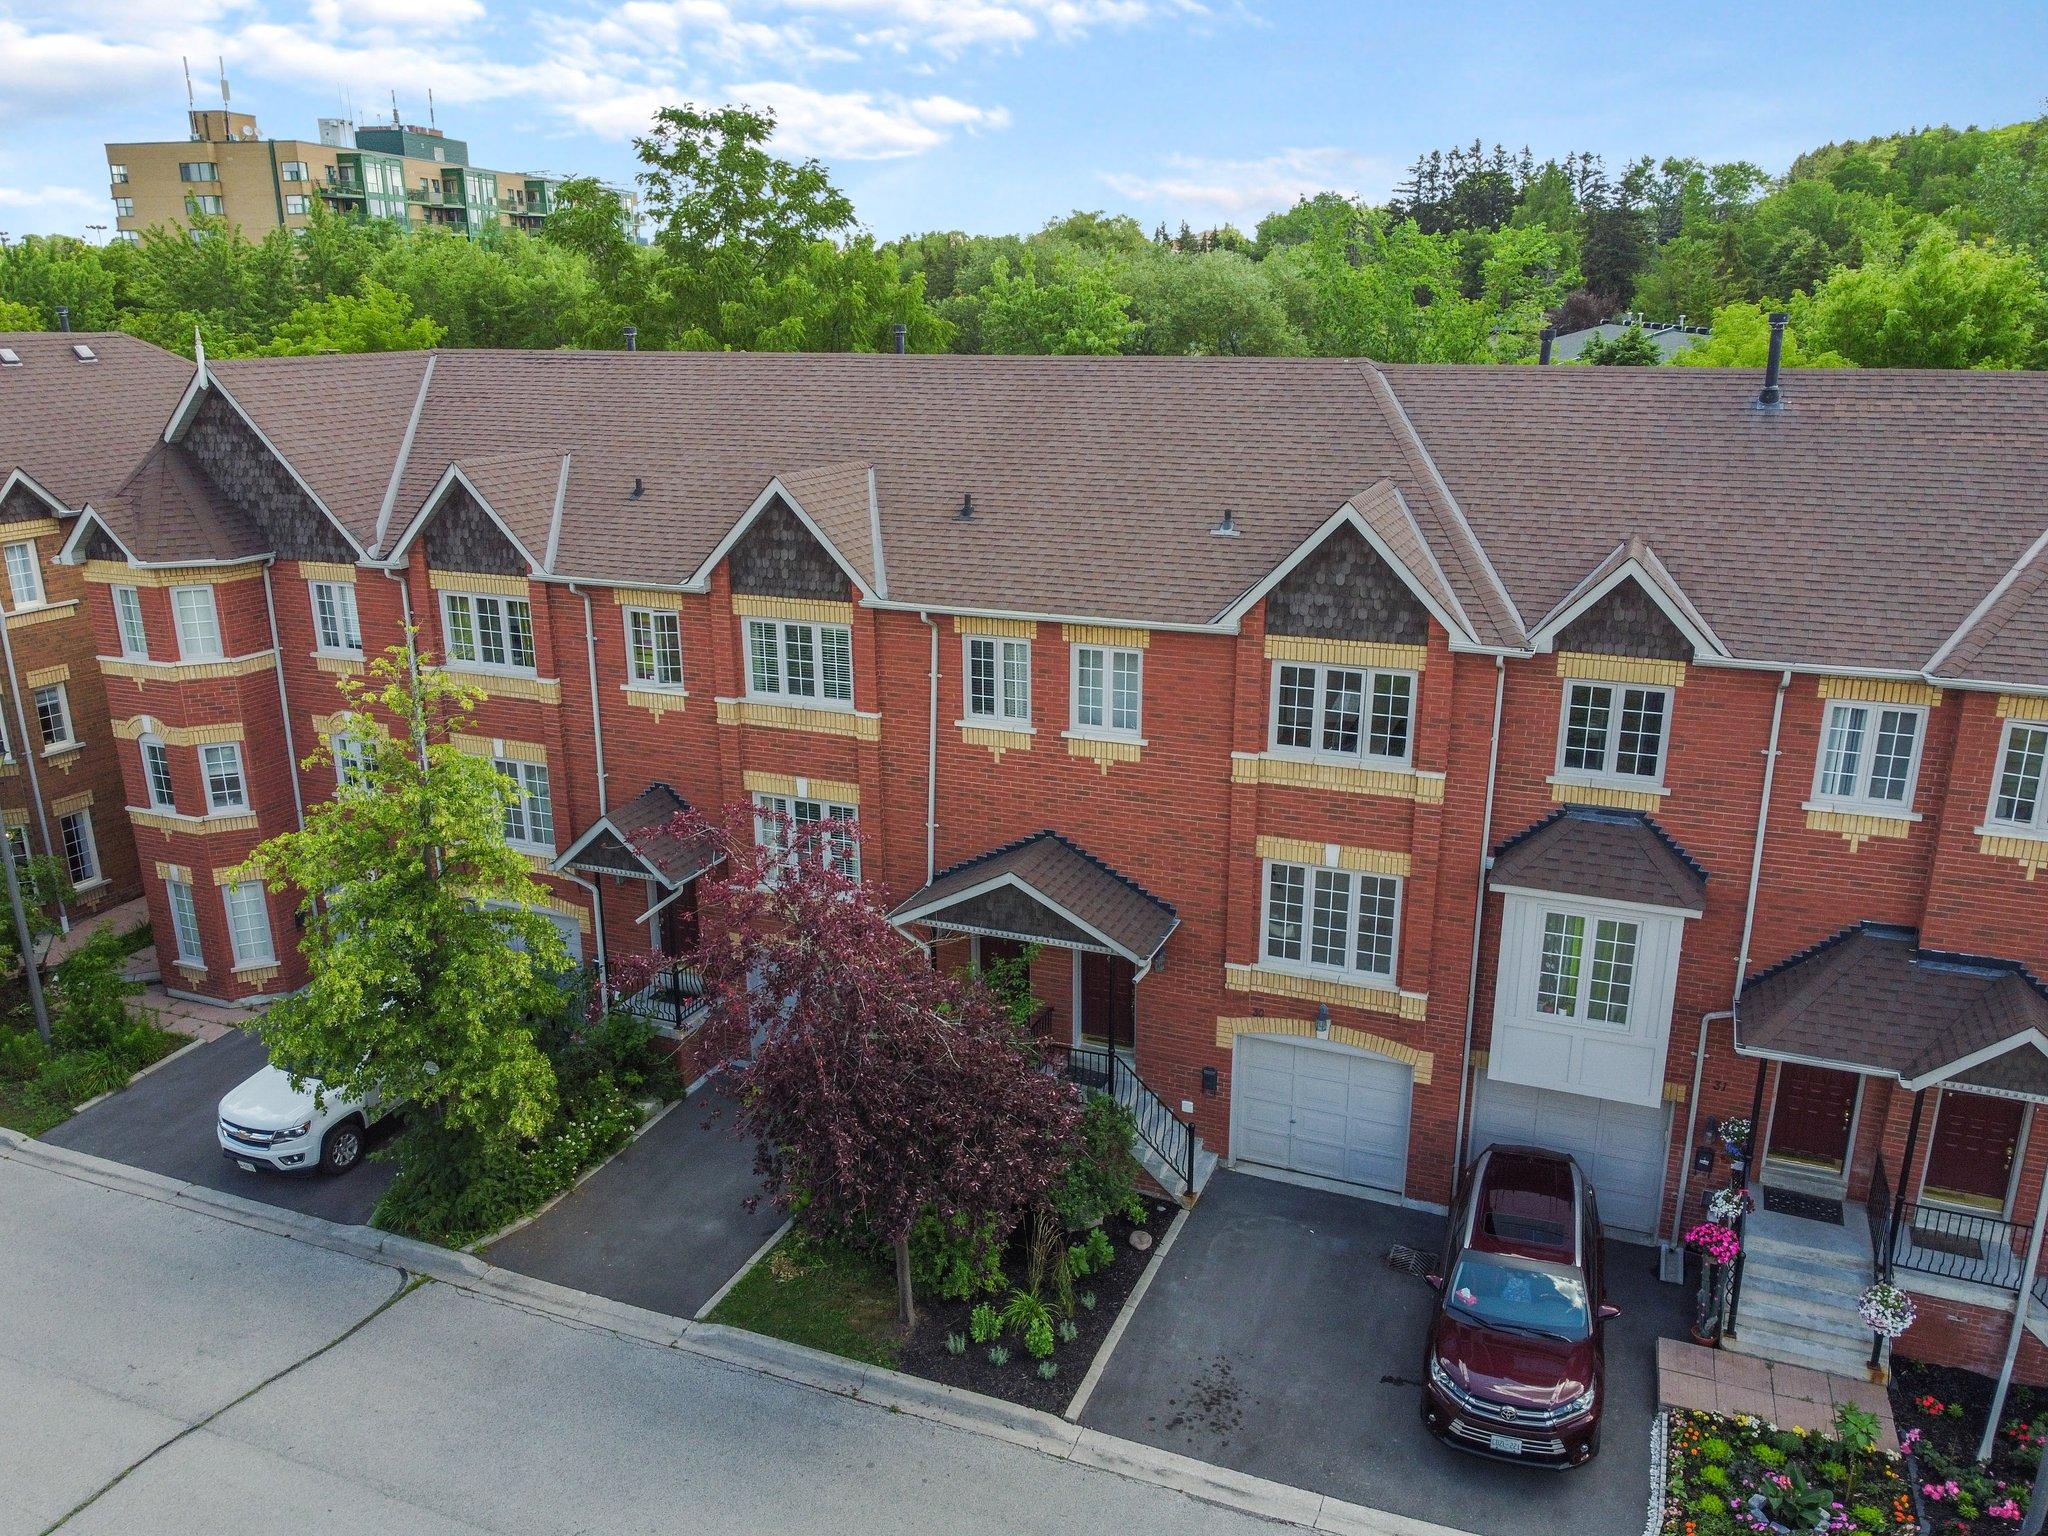 95 Weldrick Rd E, Richmond Hill, ON L4C 0H6, Canada